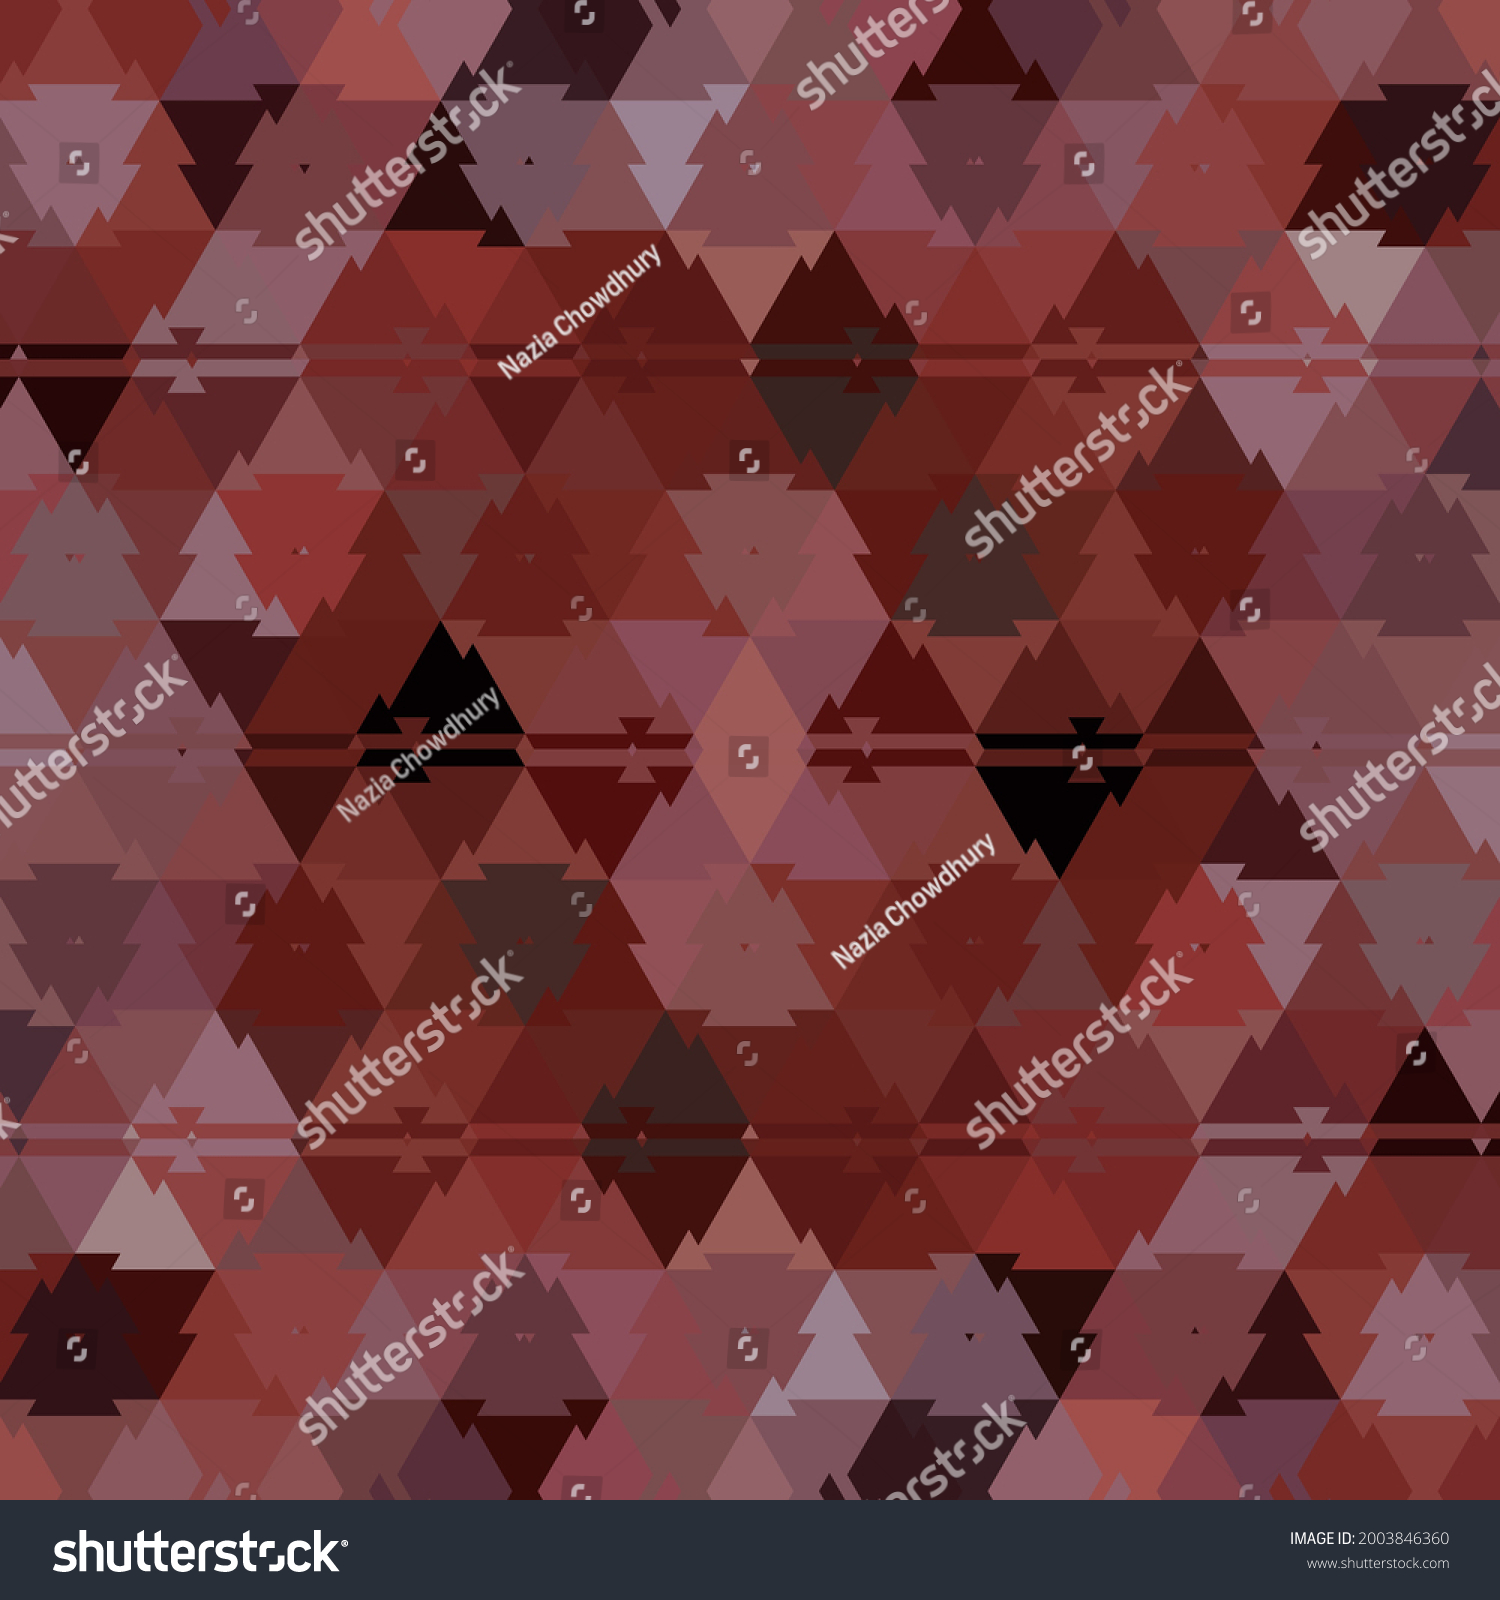 stock-photo-retro-folk-pattern-design-fo